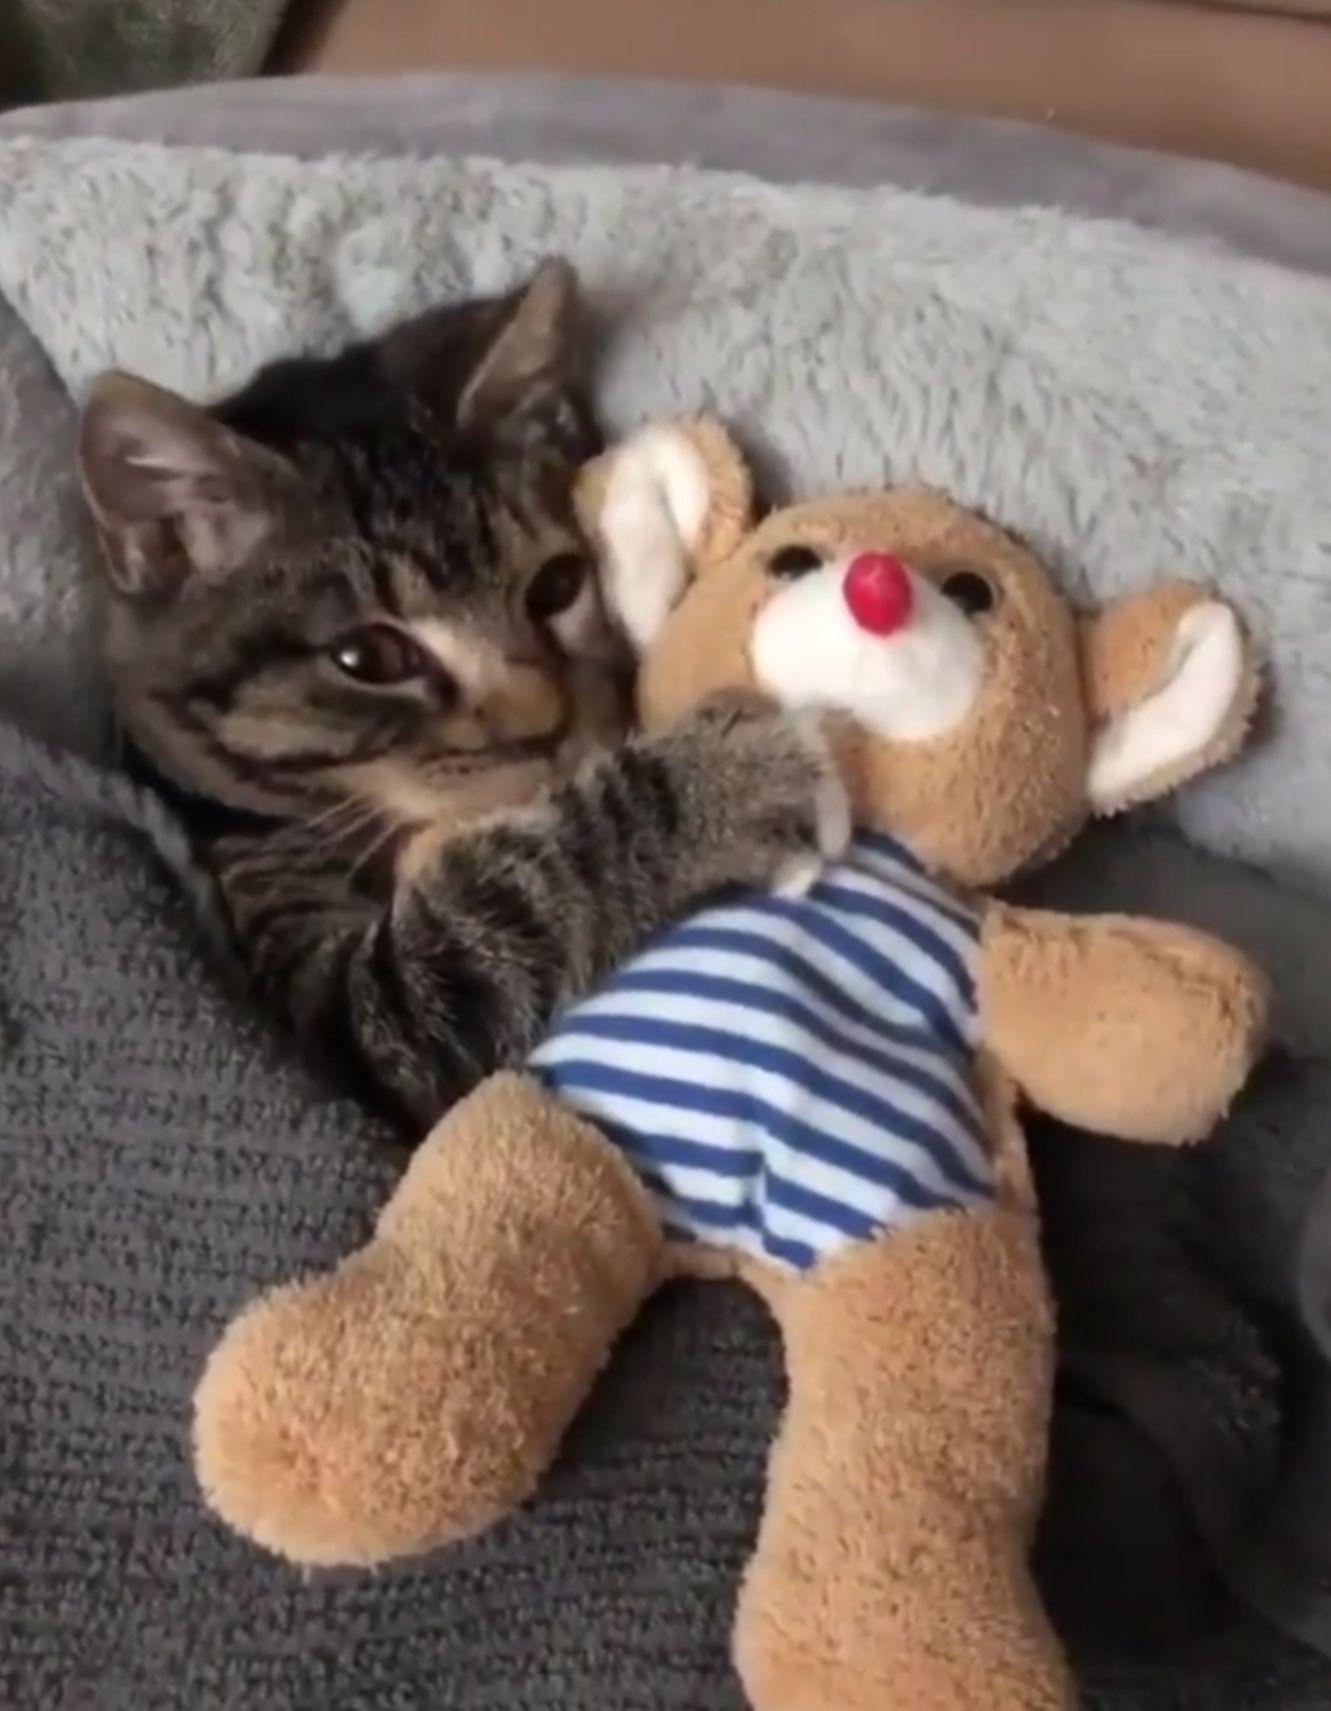 time-to-put-baby-to-sleep